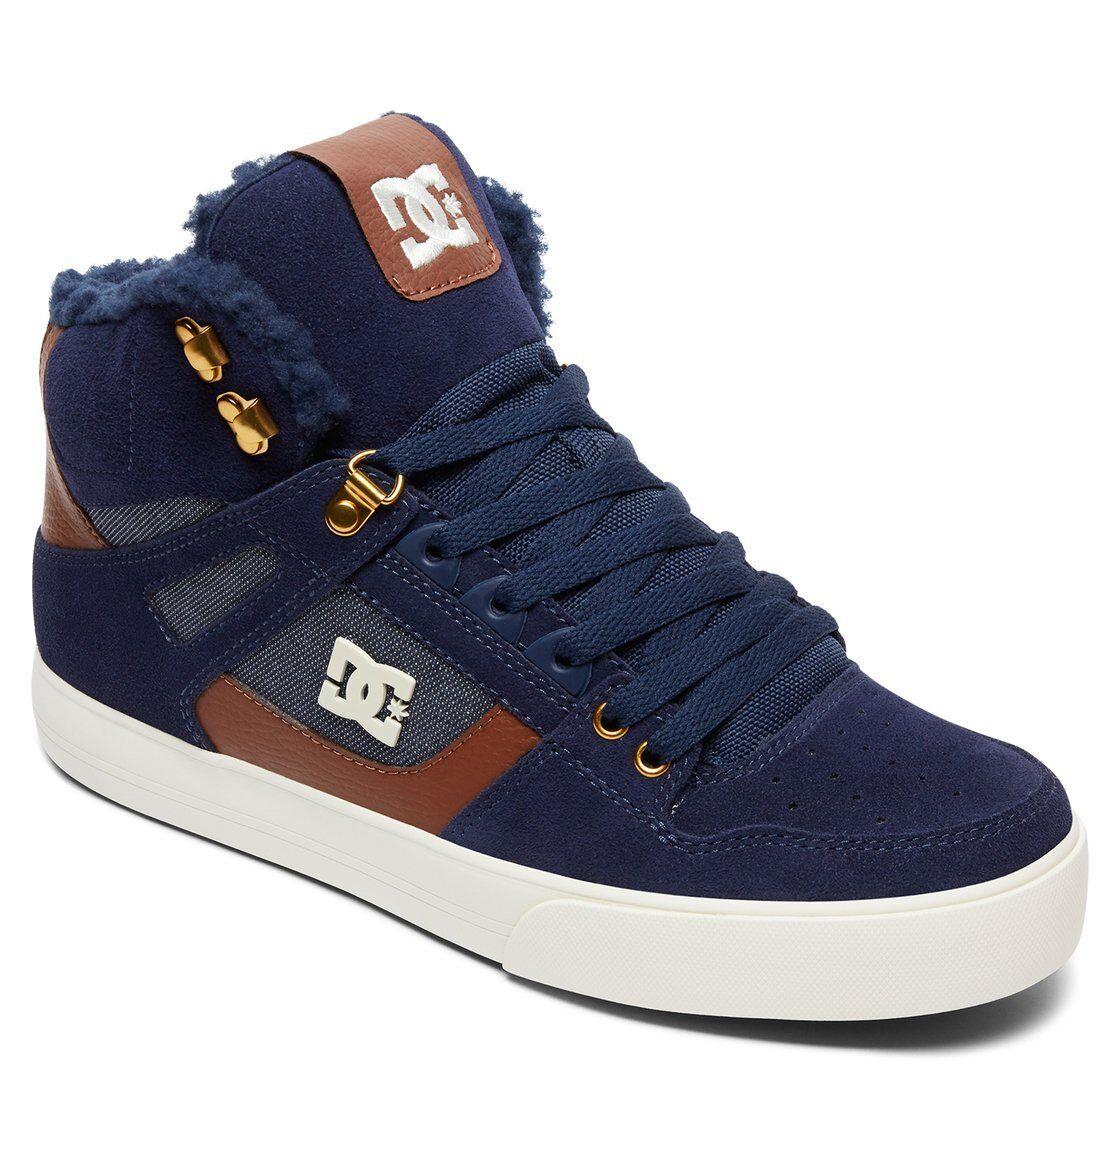 DC Shoes Skate Spartan ALTO GILLET WNT NAVY adys400005 Navy Uomo